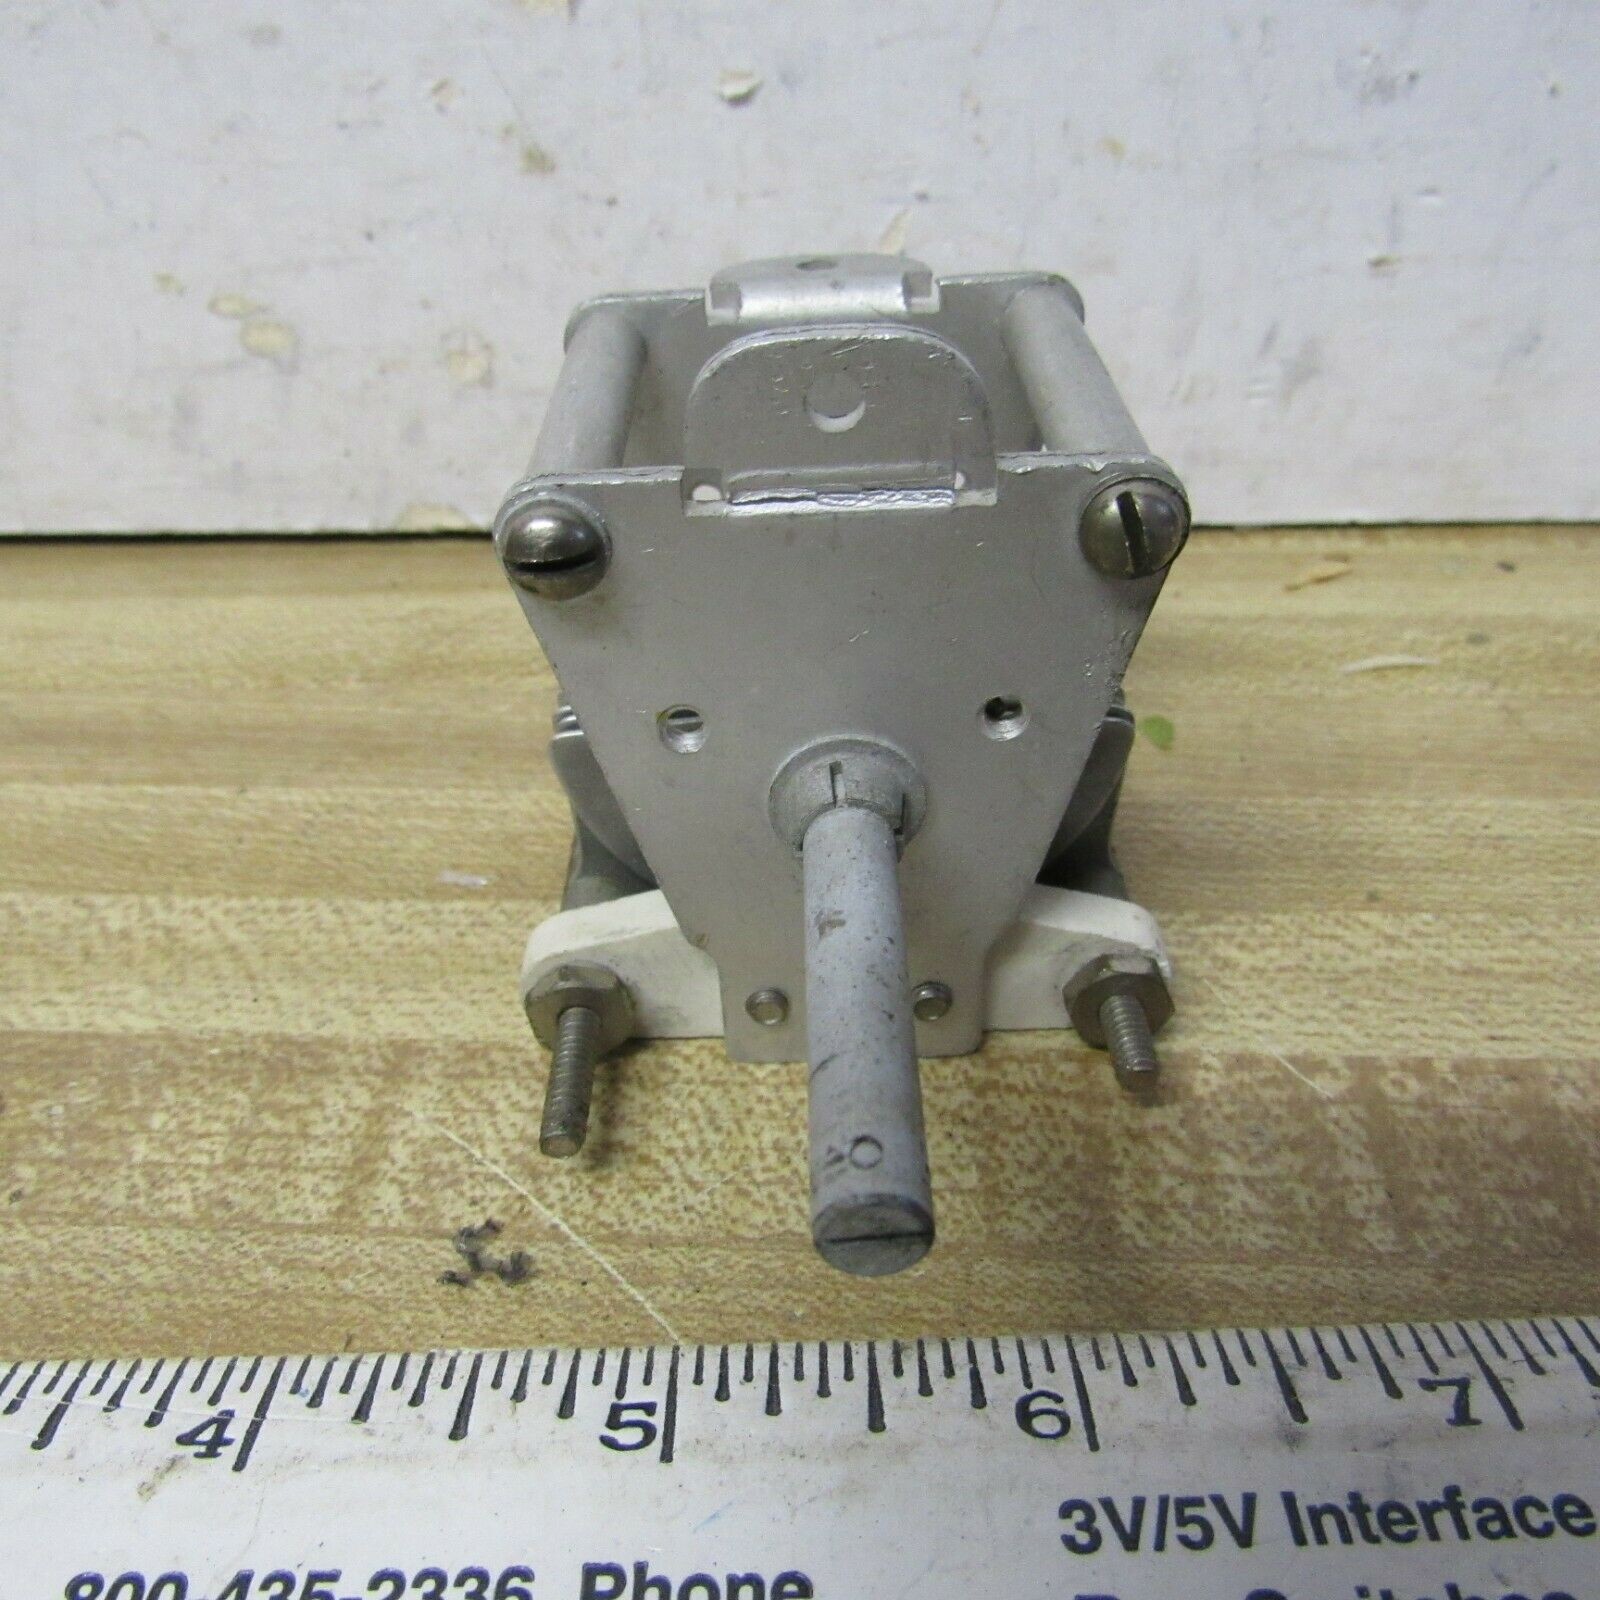 CAPACITOR Variable Capacitor 40 PF 8 To 40 PF HAM RADIO - $10.00